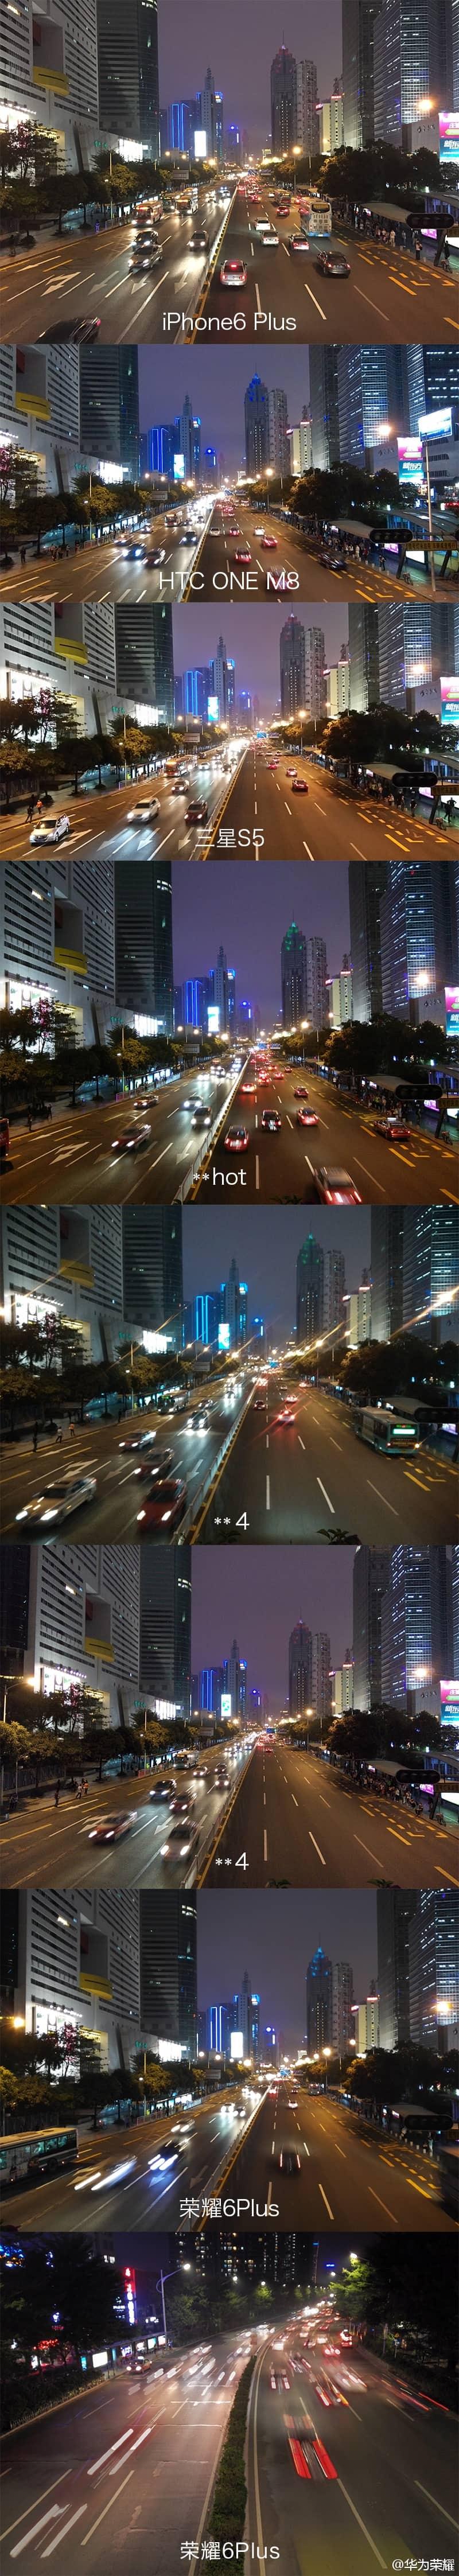 Huawei Glory 6 Plus camera comparison leak